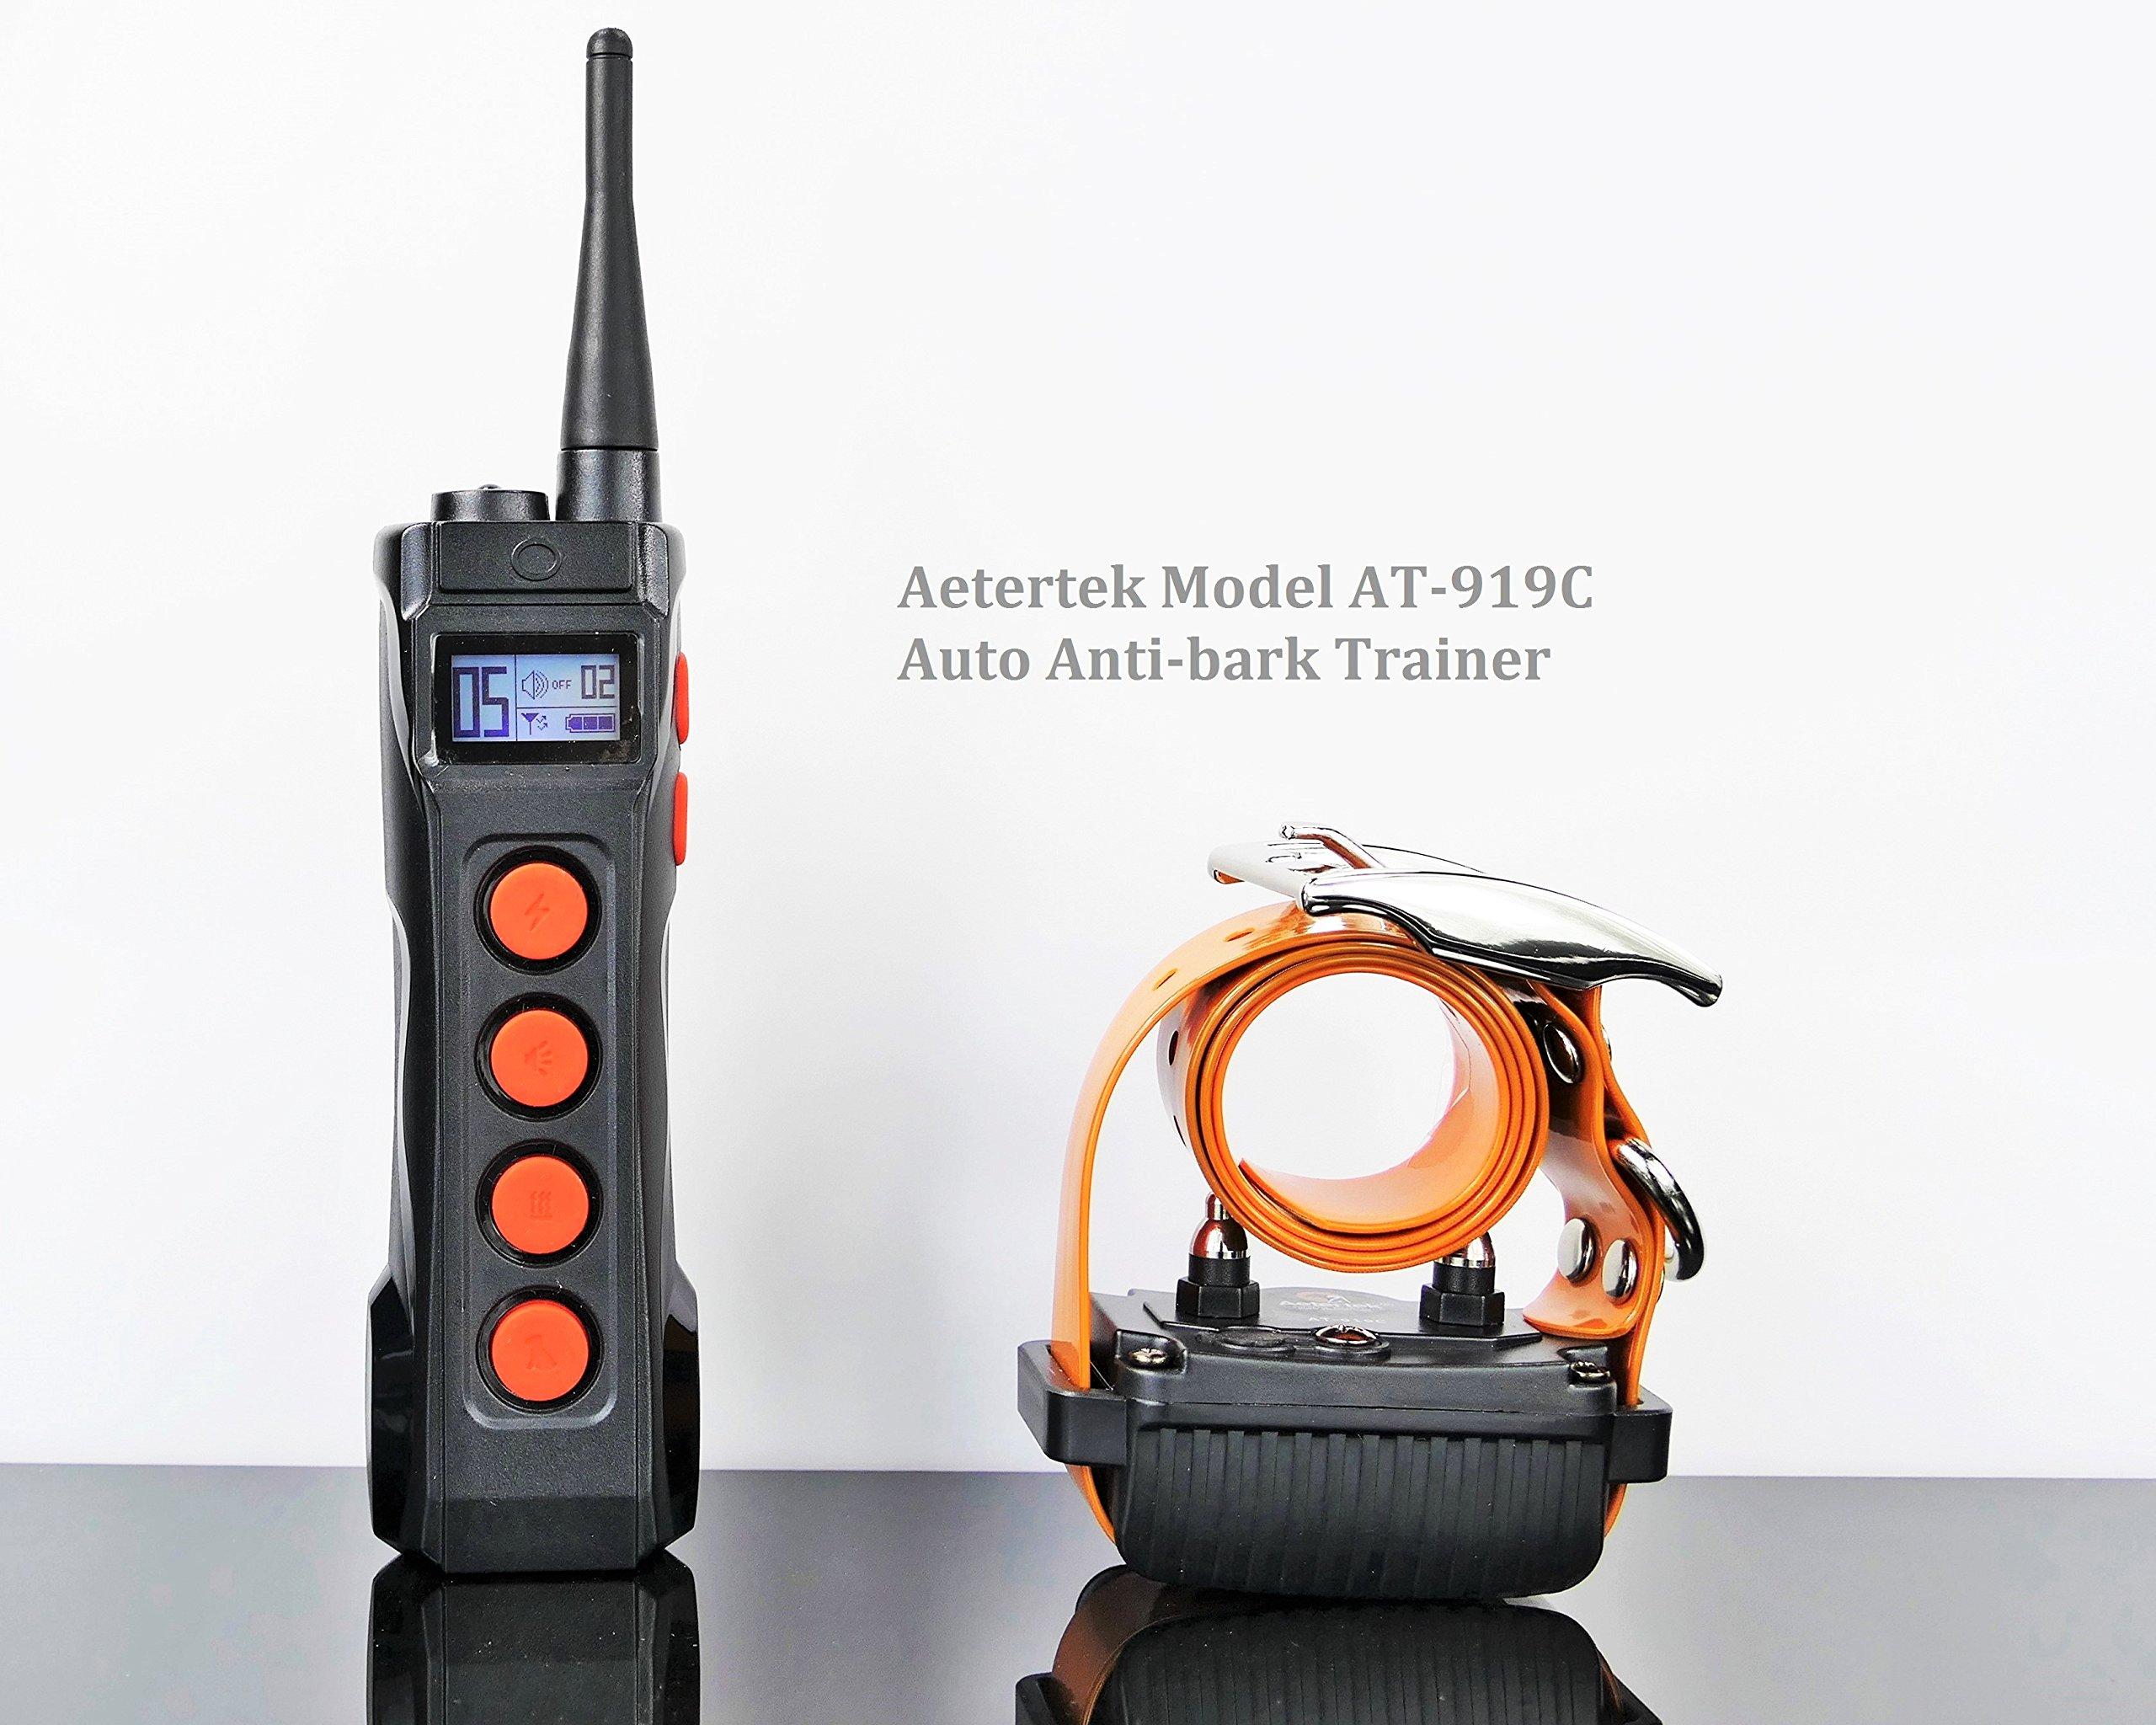 Aetertek 1100 Yard Remote Dog Training Collar Obedience Trainer: Rechargeable Waterproof Collar w/Safe Humane Tone, Vibration, Adjustable Static Shock, Auto Anti Bark by Aetertek